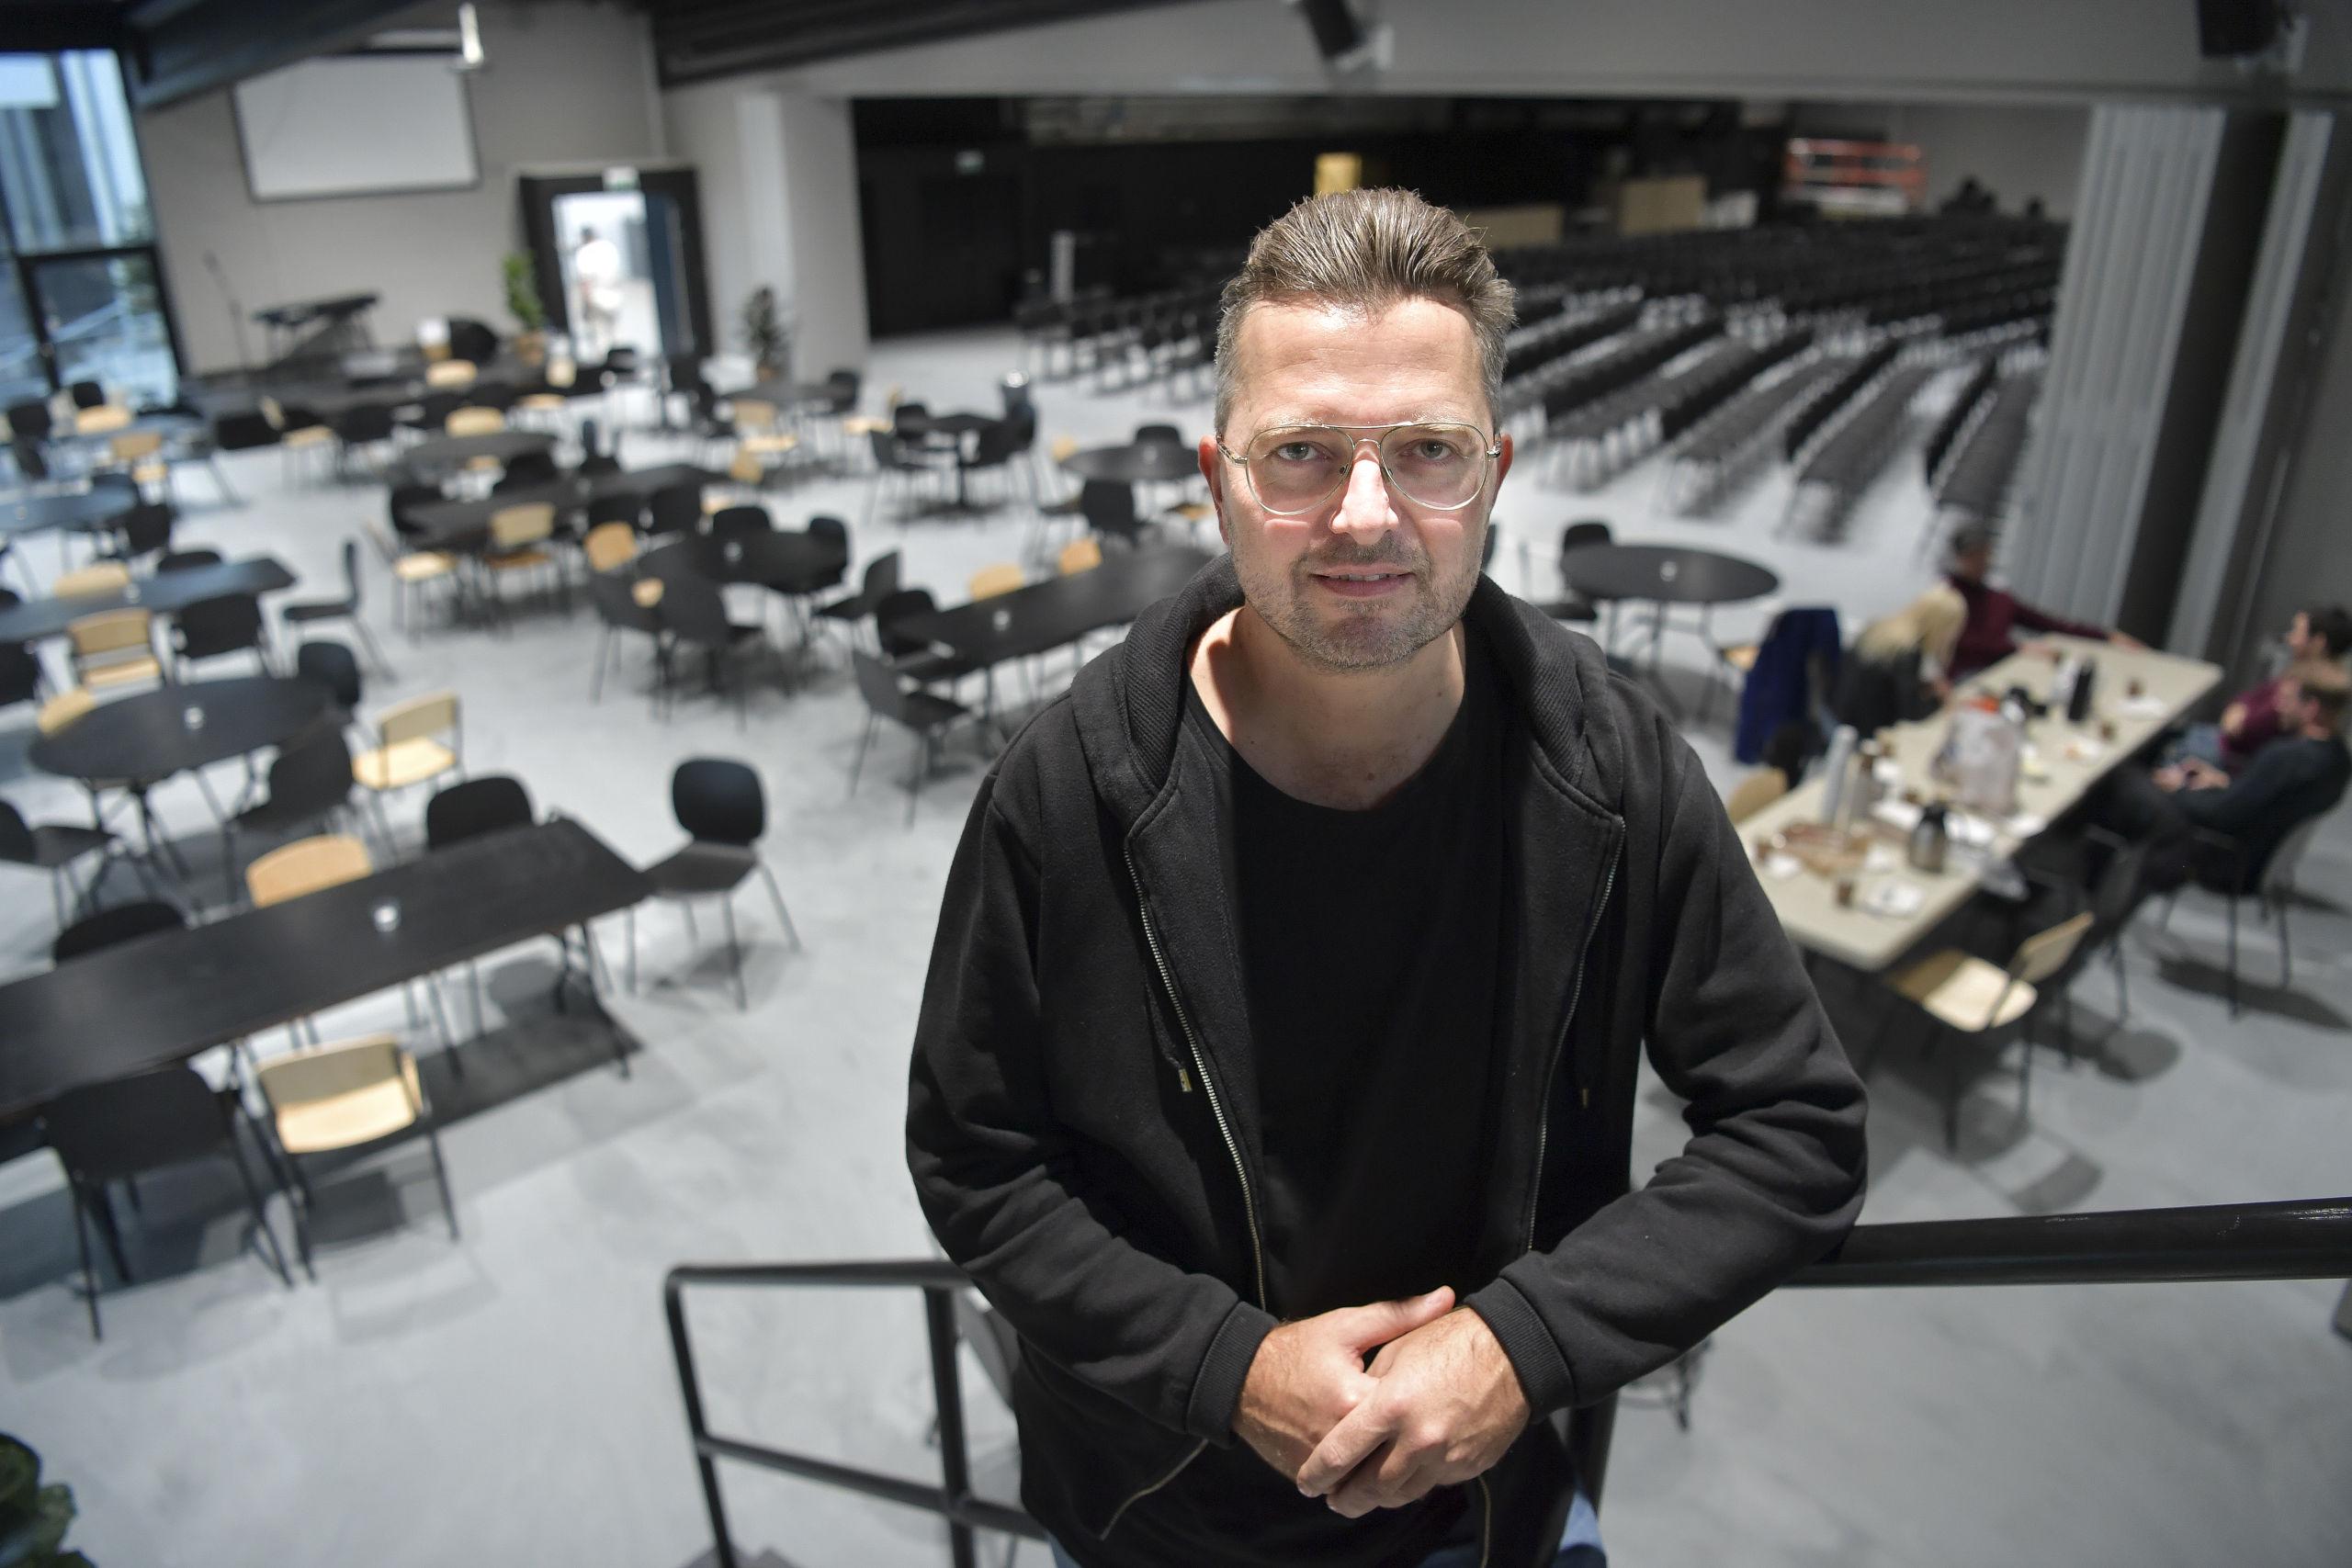 Nyt kulturhus åbner i Aalborg